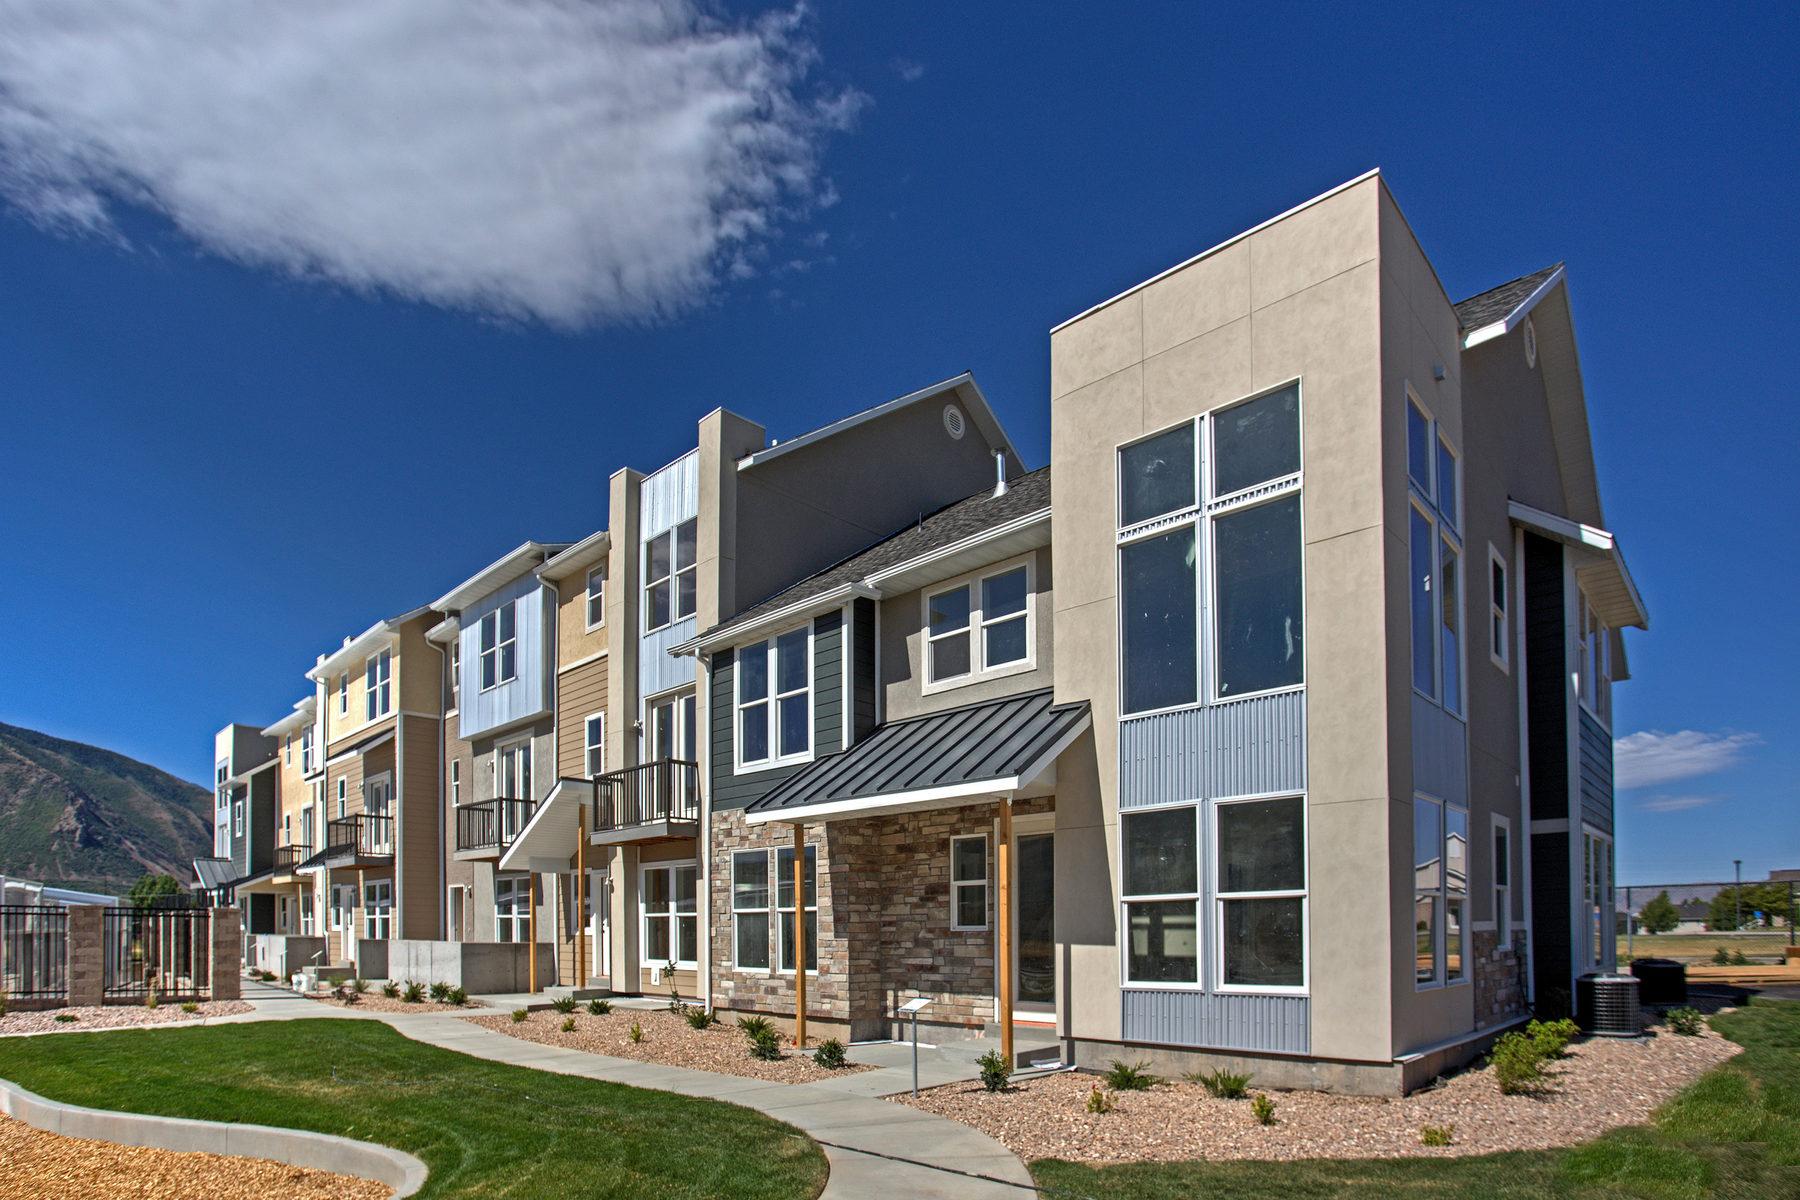 联栋屋 为 销售 在 The Soho Design at The Ridge 1042 S High Ridge Rd Spanish Fork, 犹他州, 84660 美国